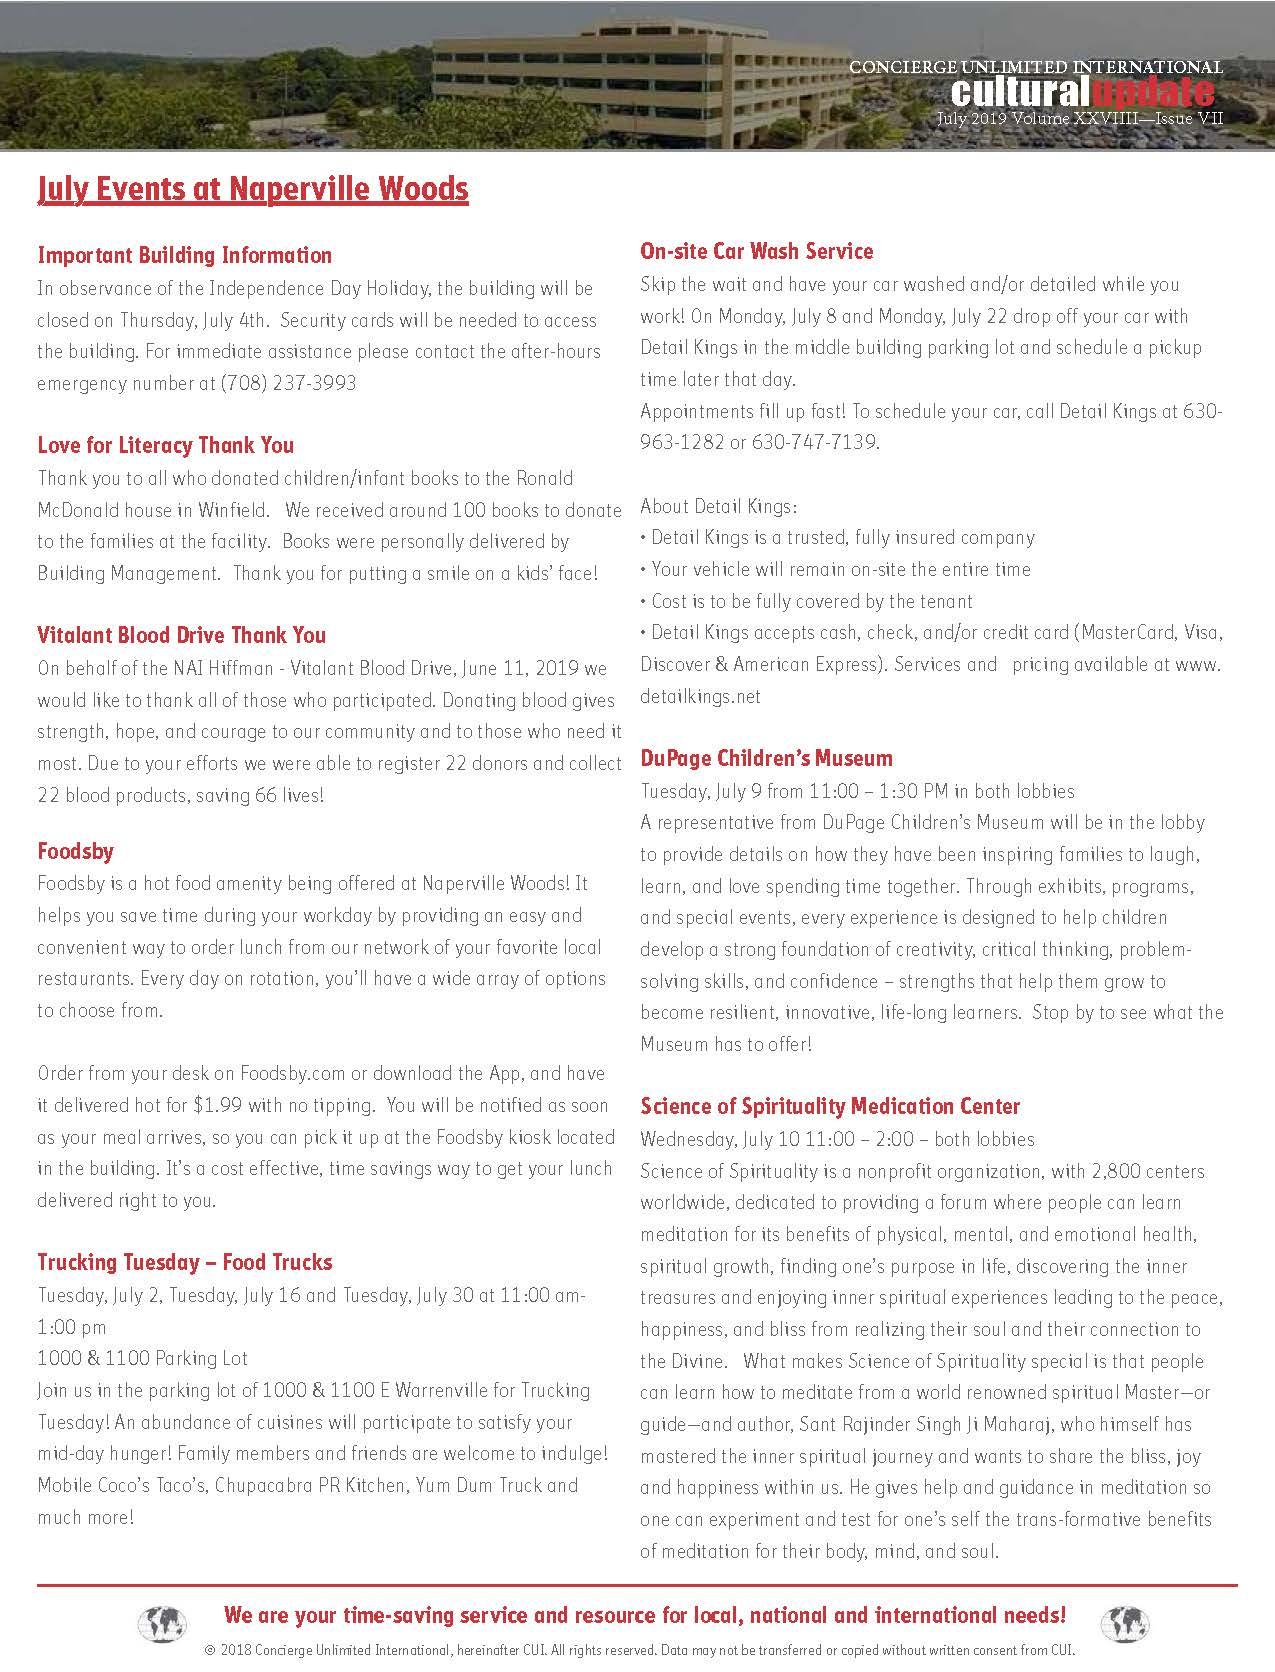 NWOC - July Cultural Update- Event Calendar_Page_1.jpg